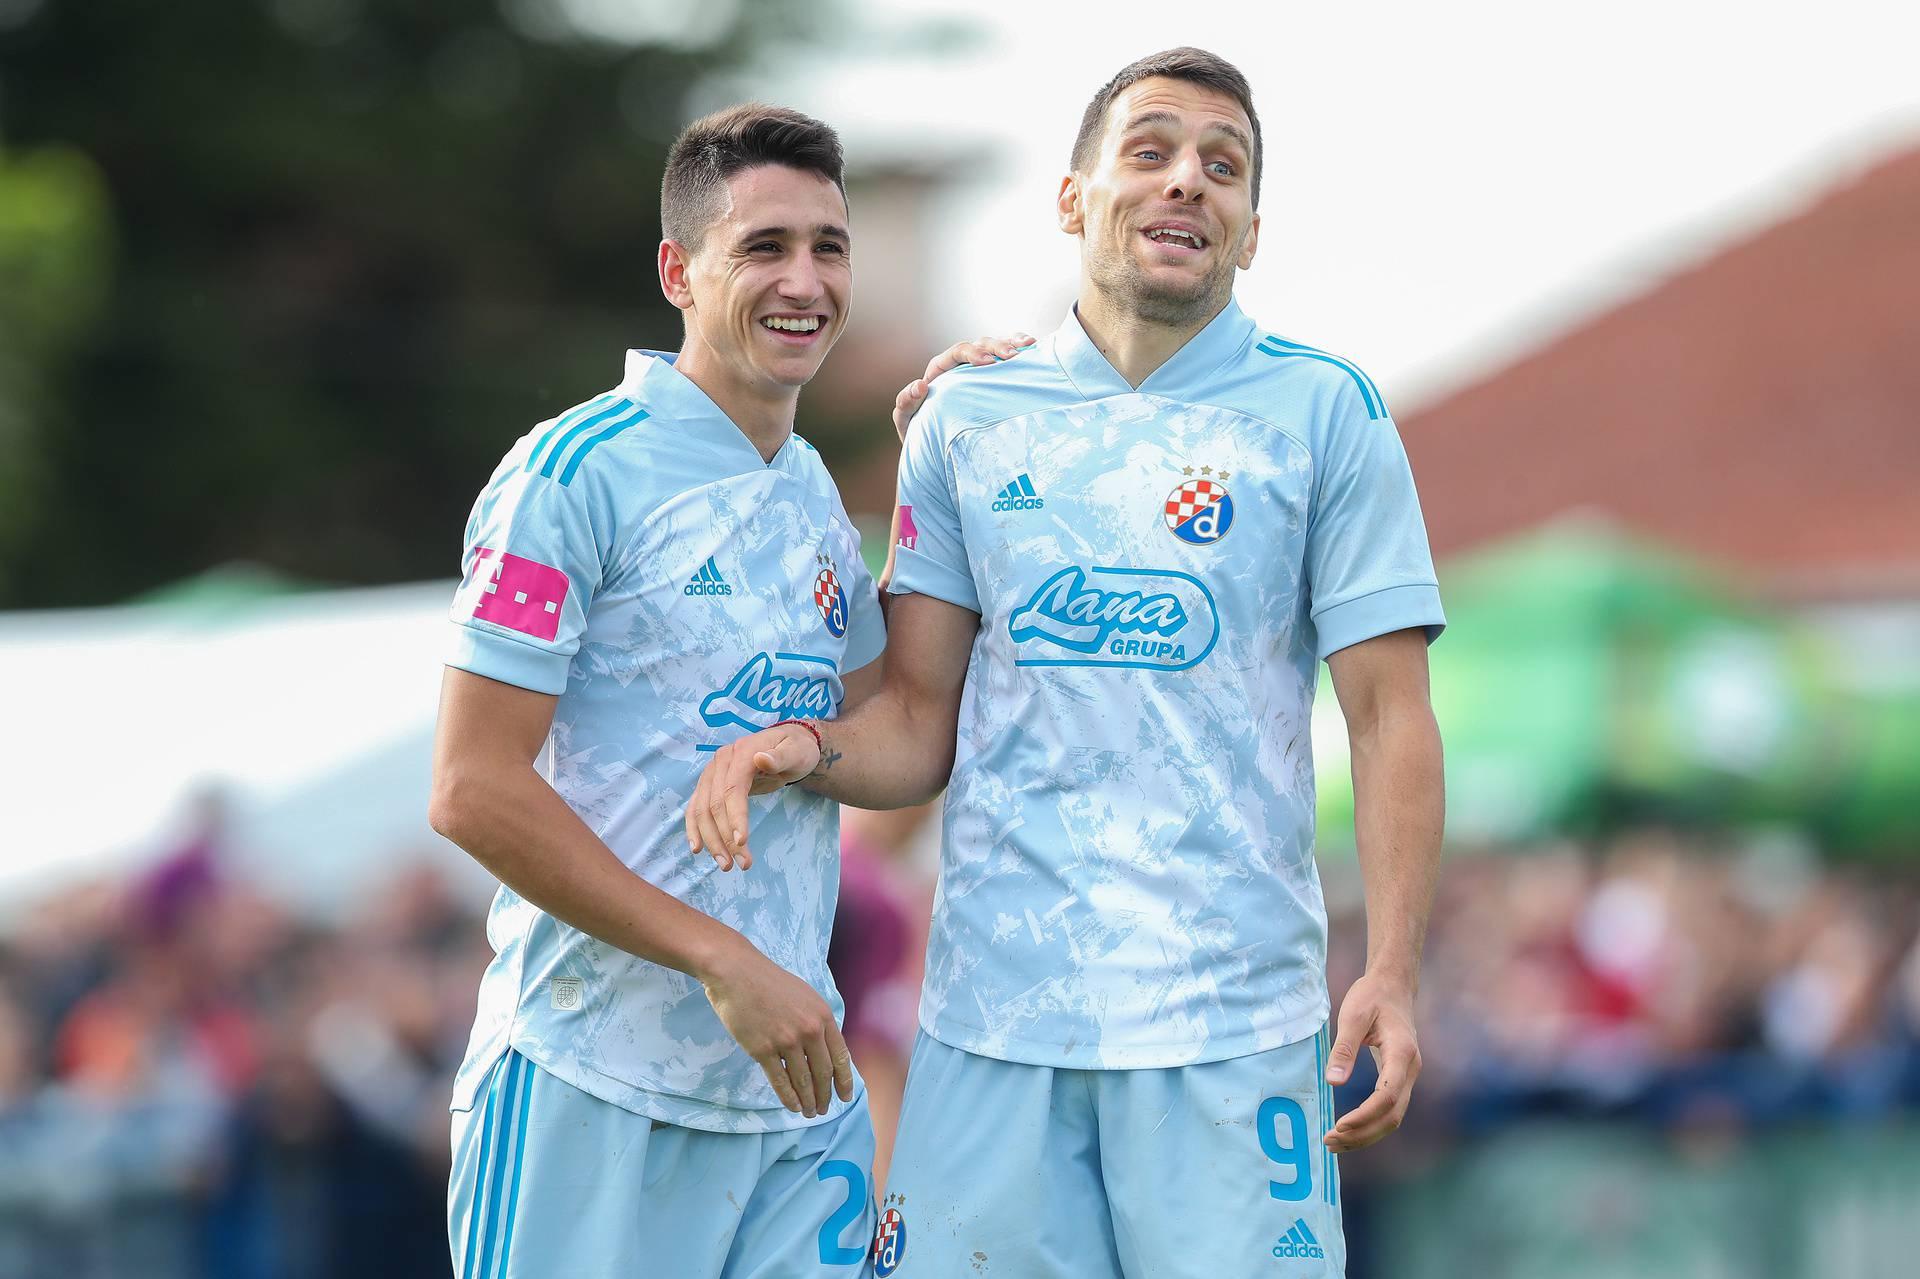 Ferdinandovac: NK Ferdinandovac i GNK Dinamo u 1/16 finala Hrvatskog nogometnog kupa